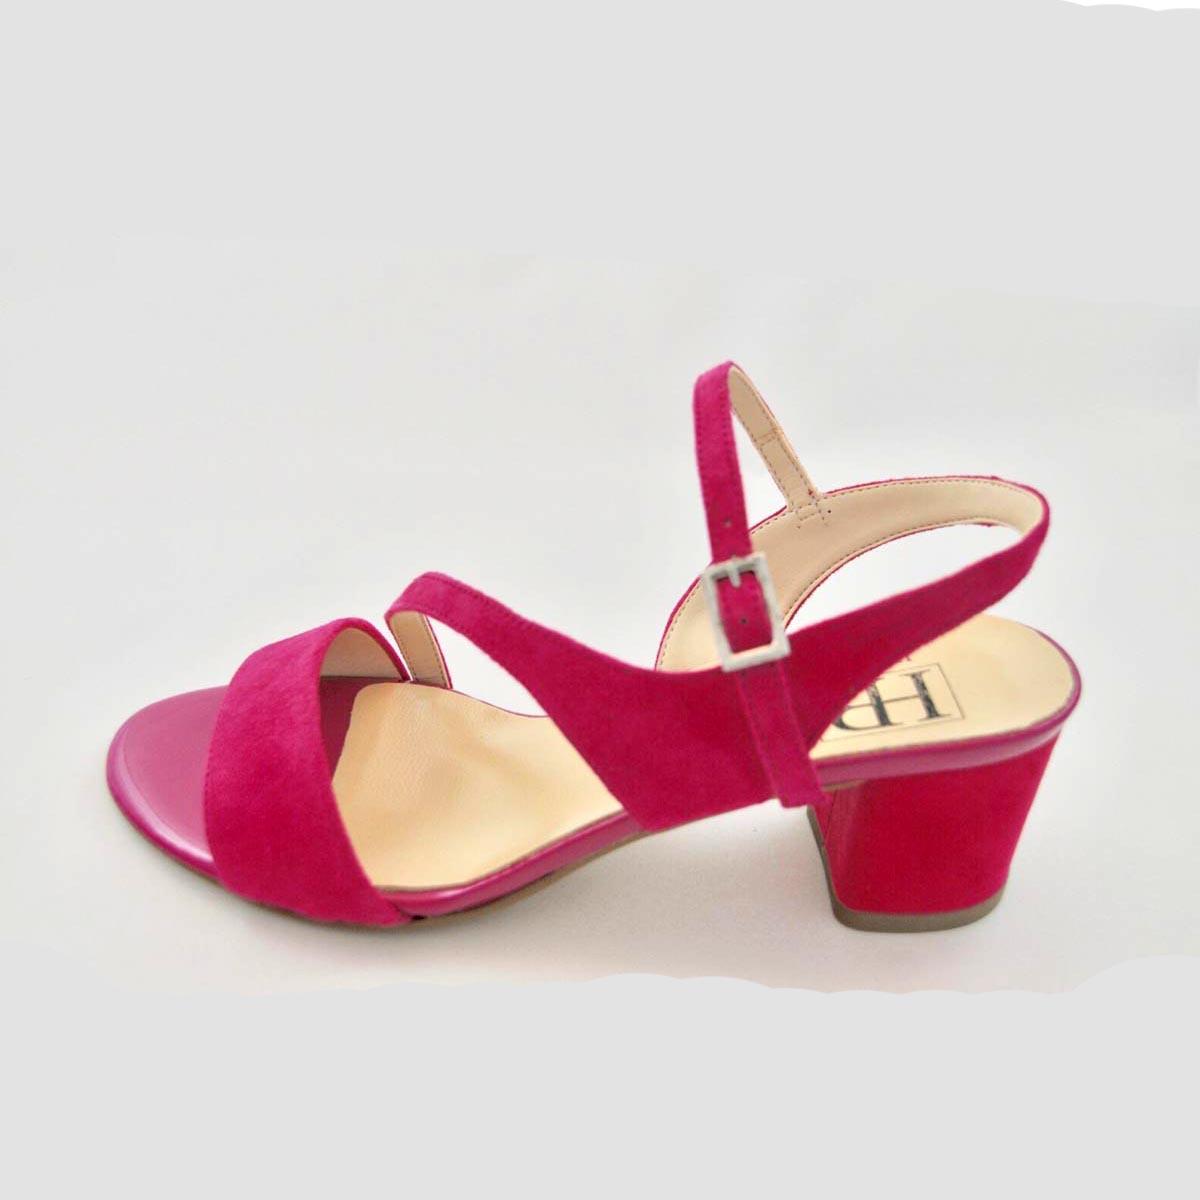 HB Italia - Puglia Pink Suede Sandal